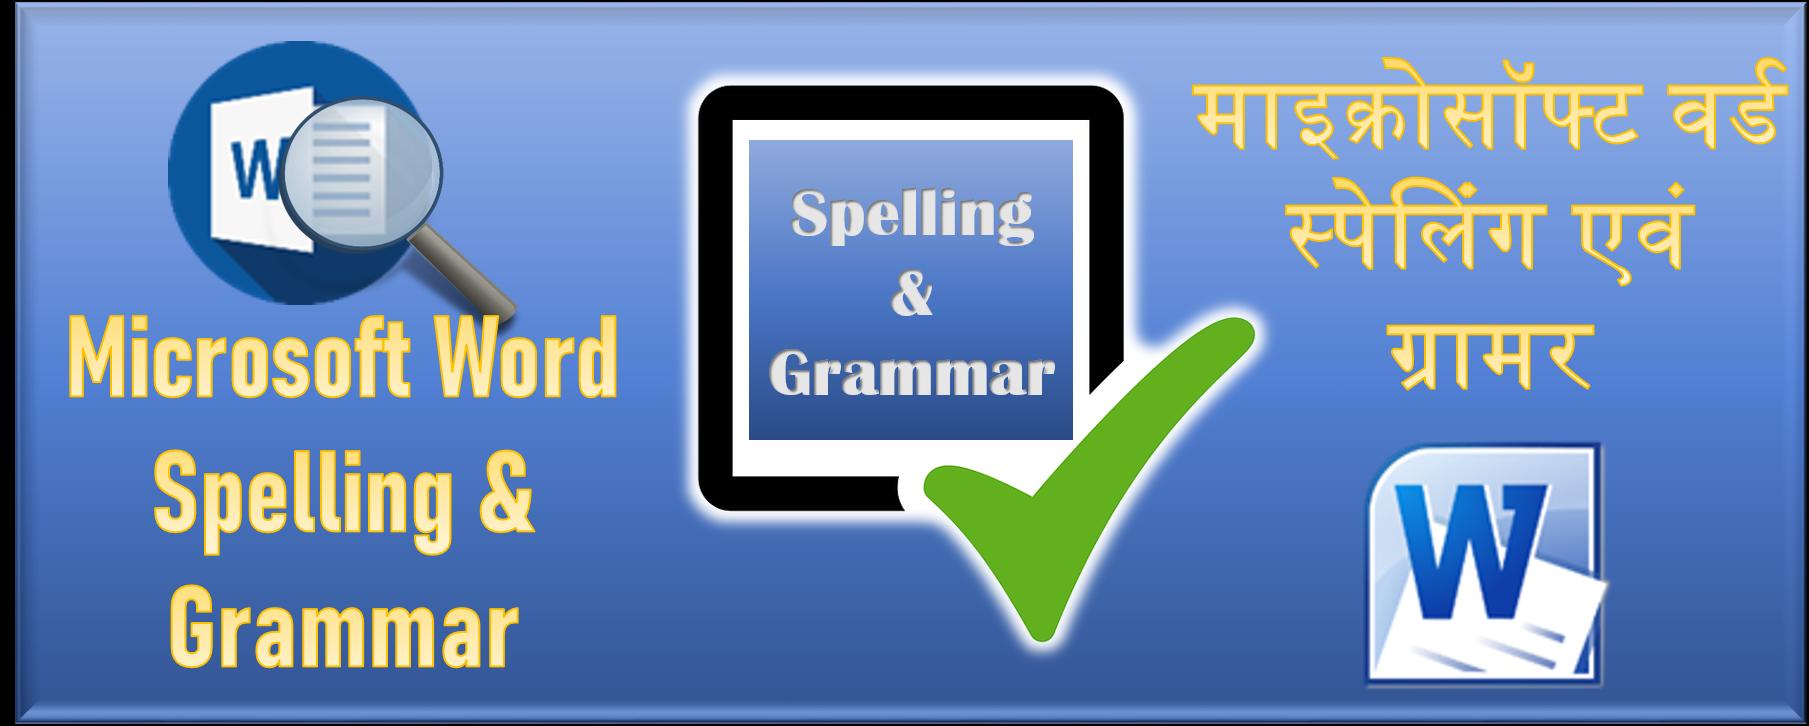 check Spelling & Grammar in MS-Word?